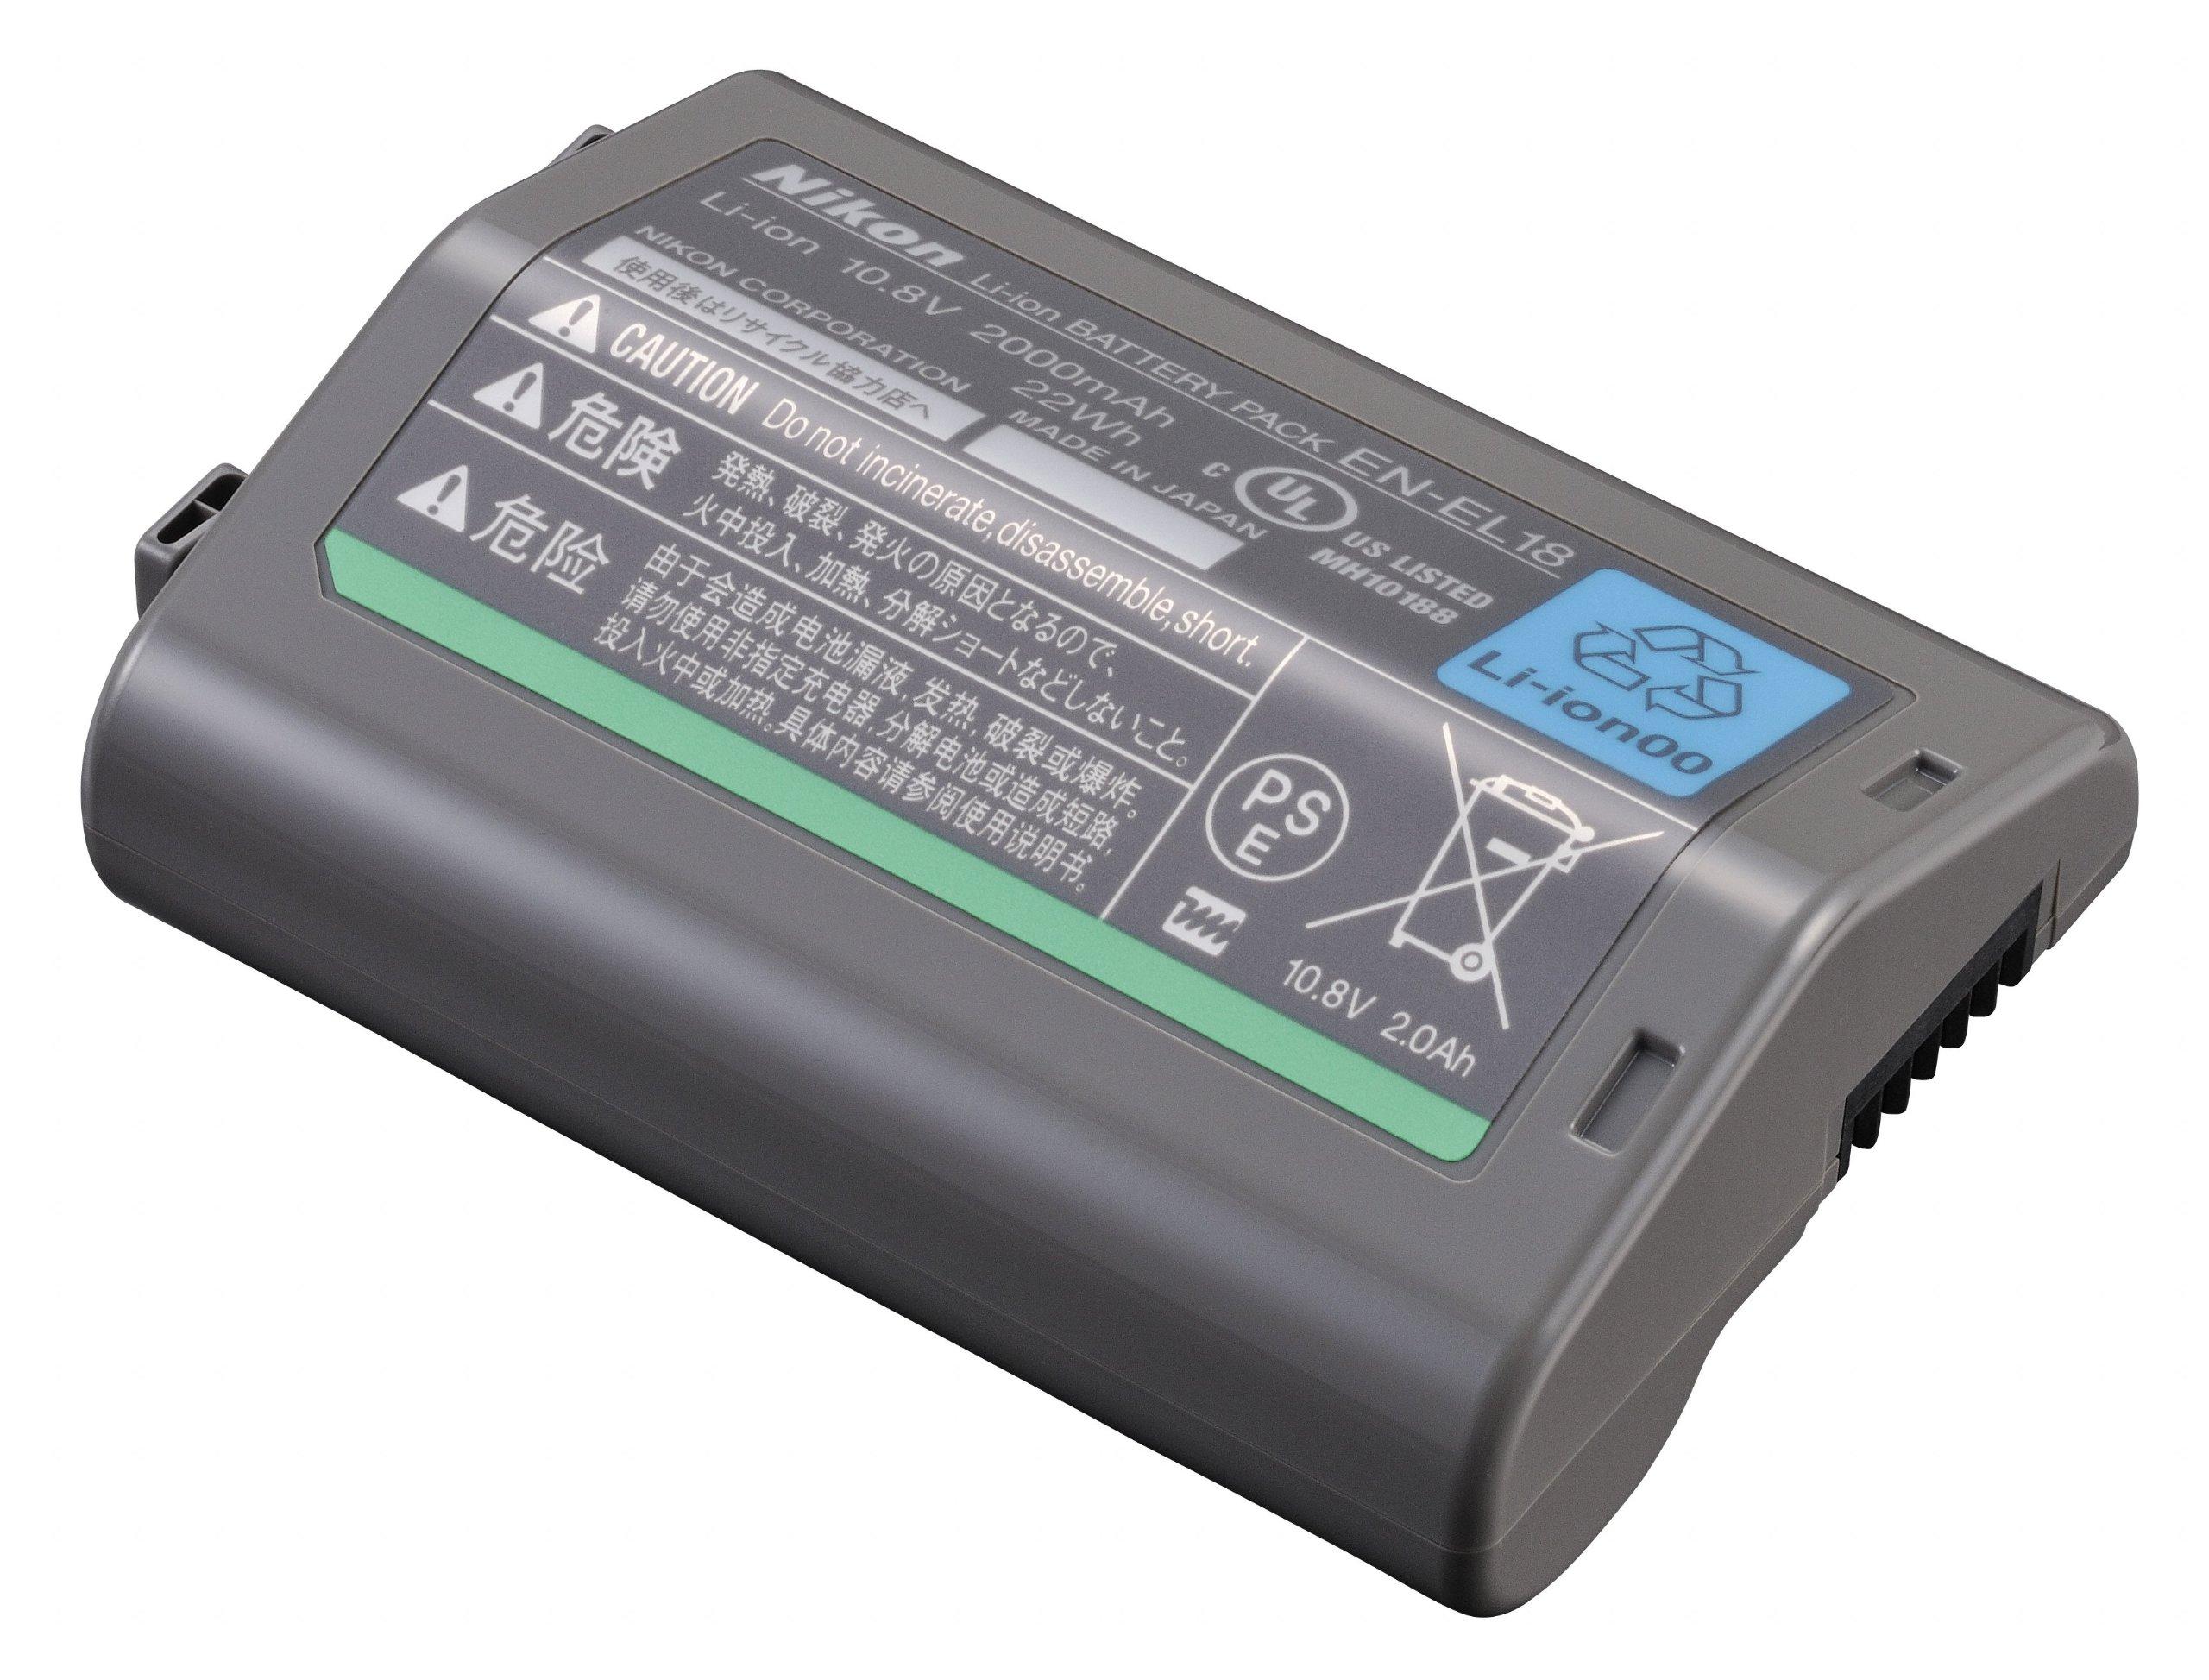 Nikon EN-EL18 Rechargeable Li-ion Battery for D4 Digital SLR by Nikon